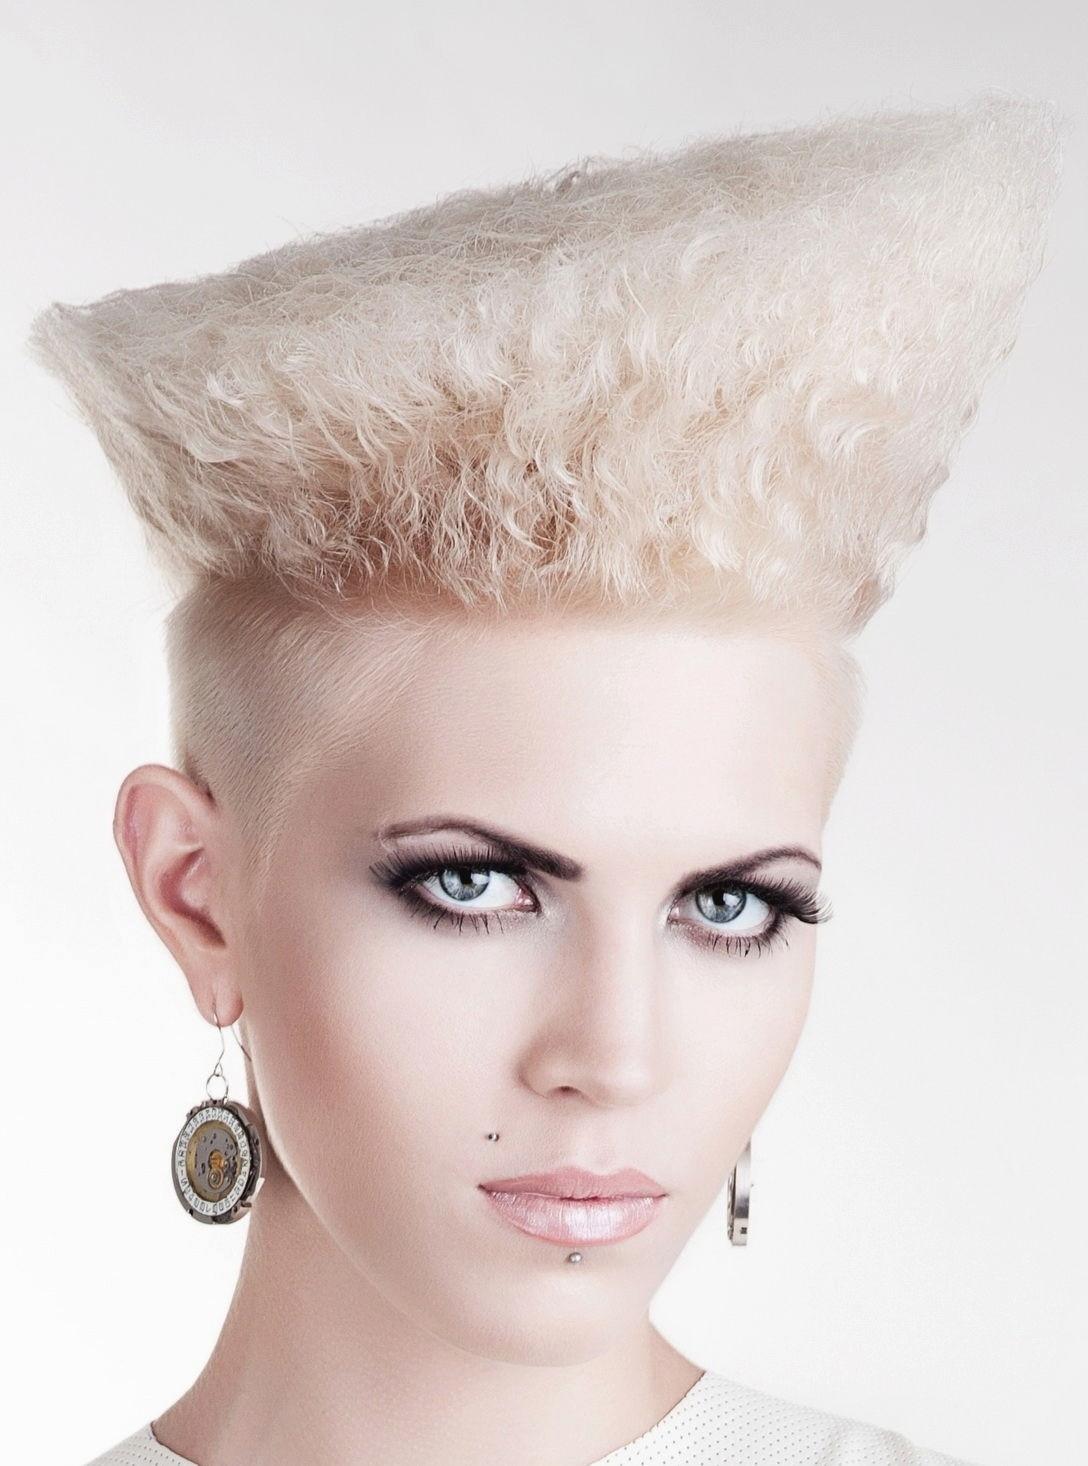 Female Undercut Hairstyles  Women Undercut Hairstyle